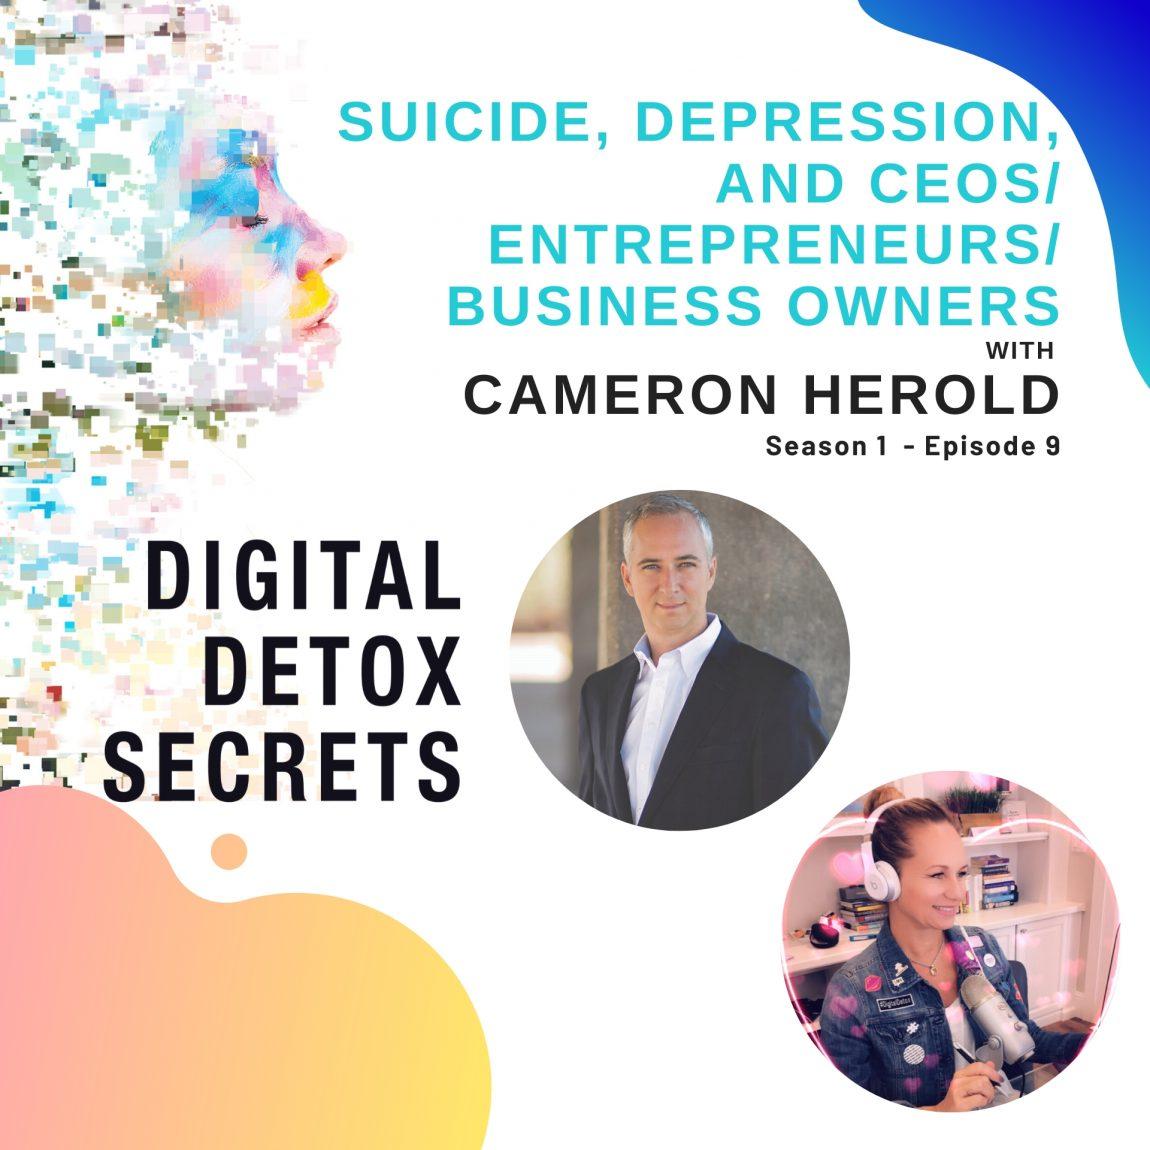 Cameron Herold